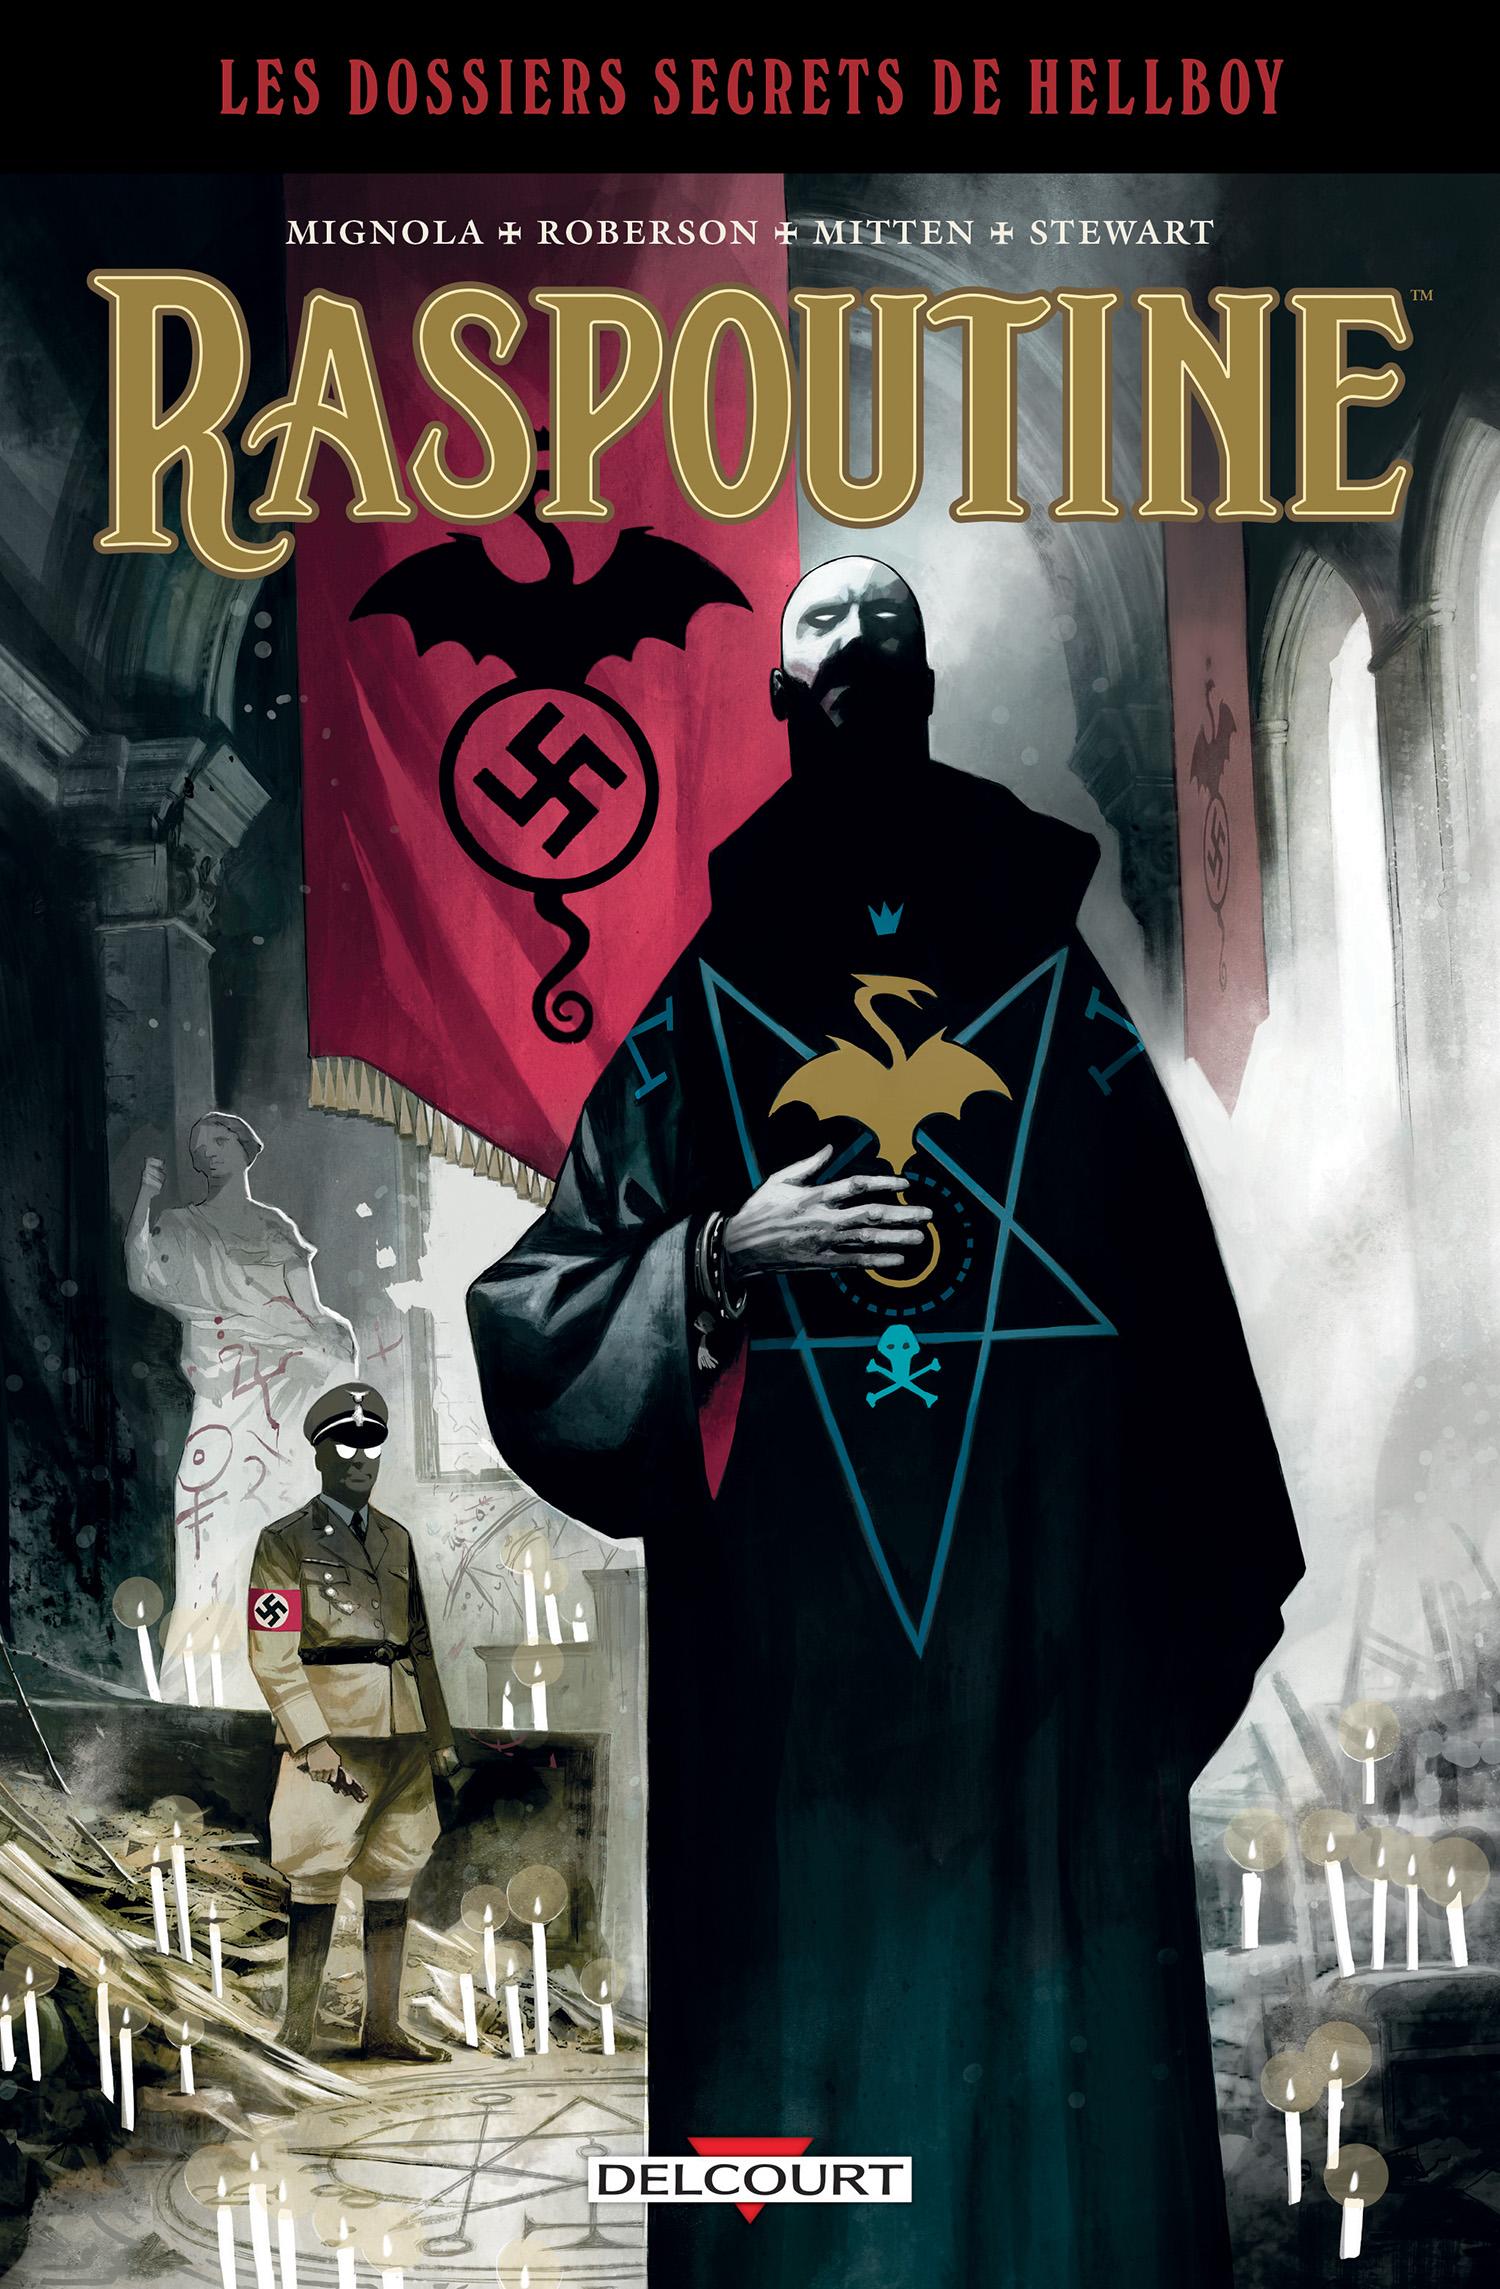 Hellboy : Dossiers secrets : Raspoutine : La voie du dragon (0), comics chez Delcourt de Roberson, Mignola, Mitten, Stewart, Huddleston